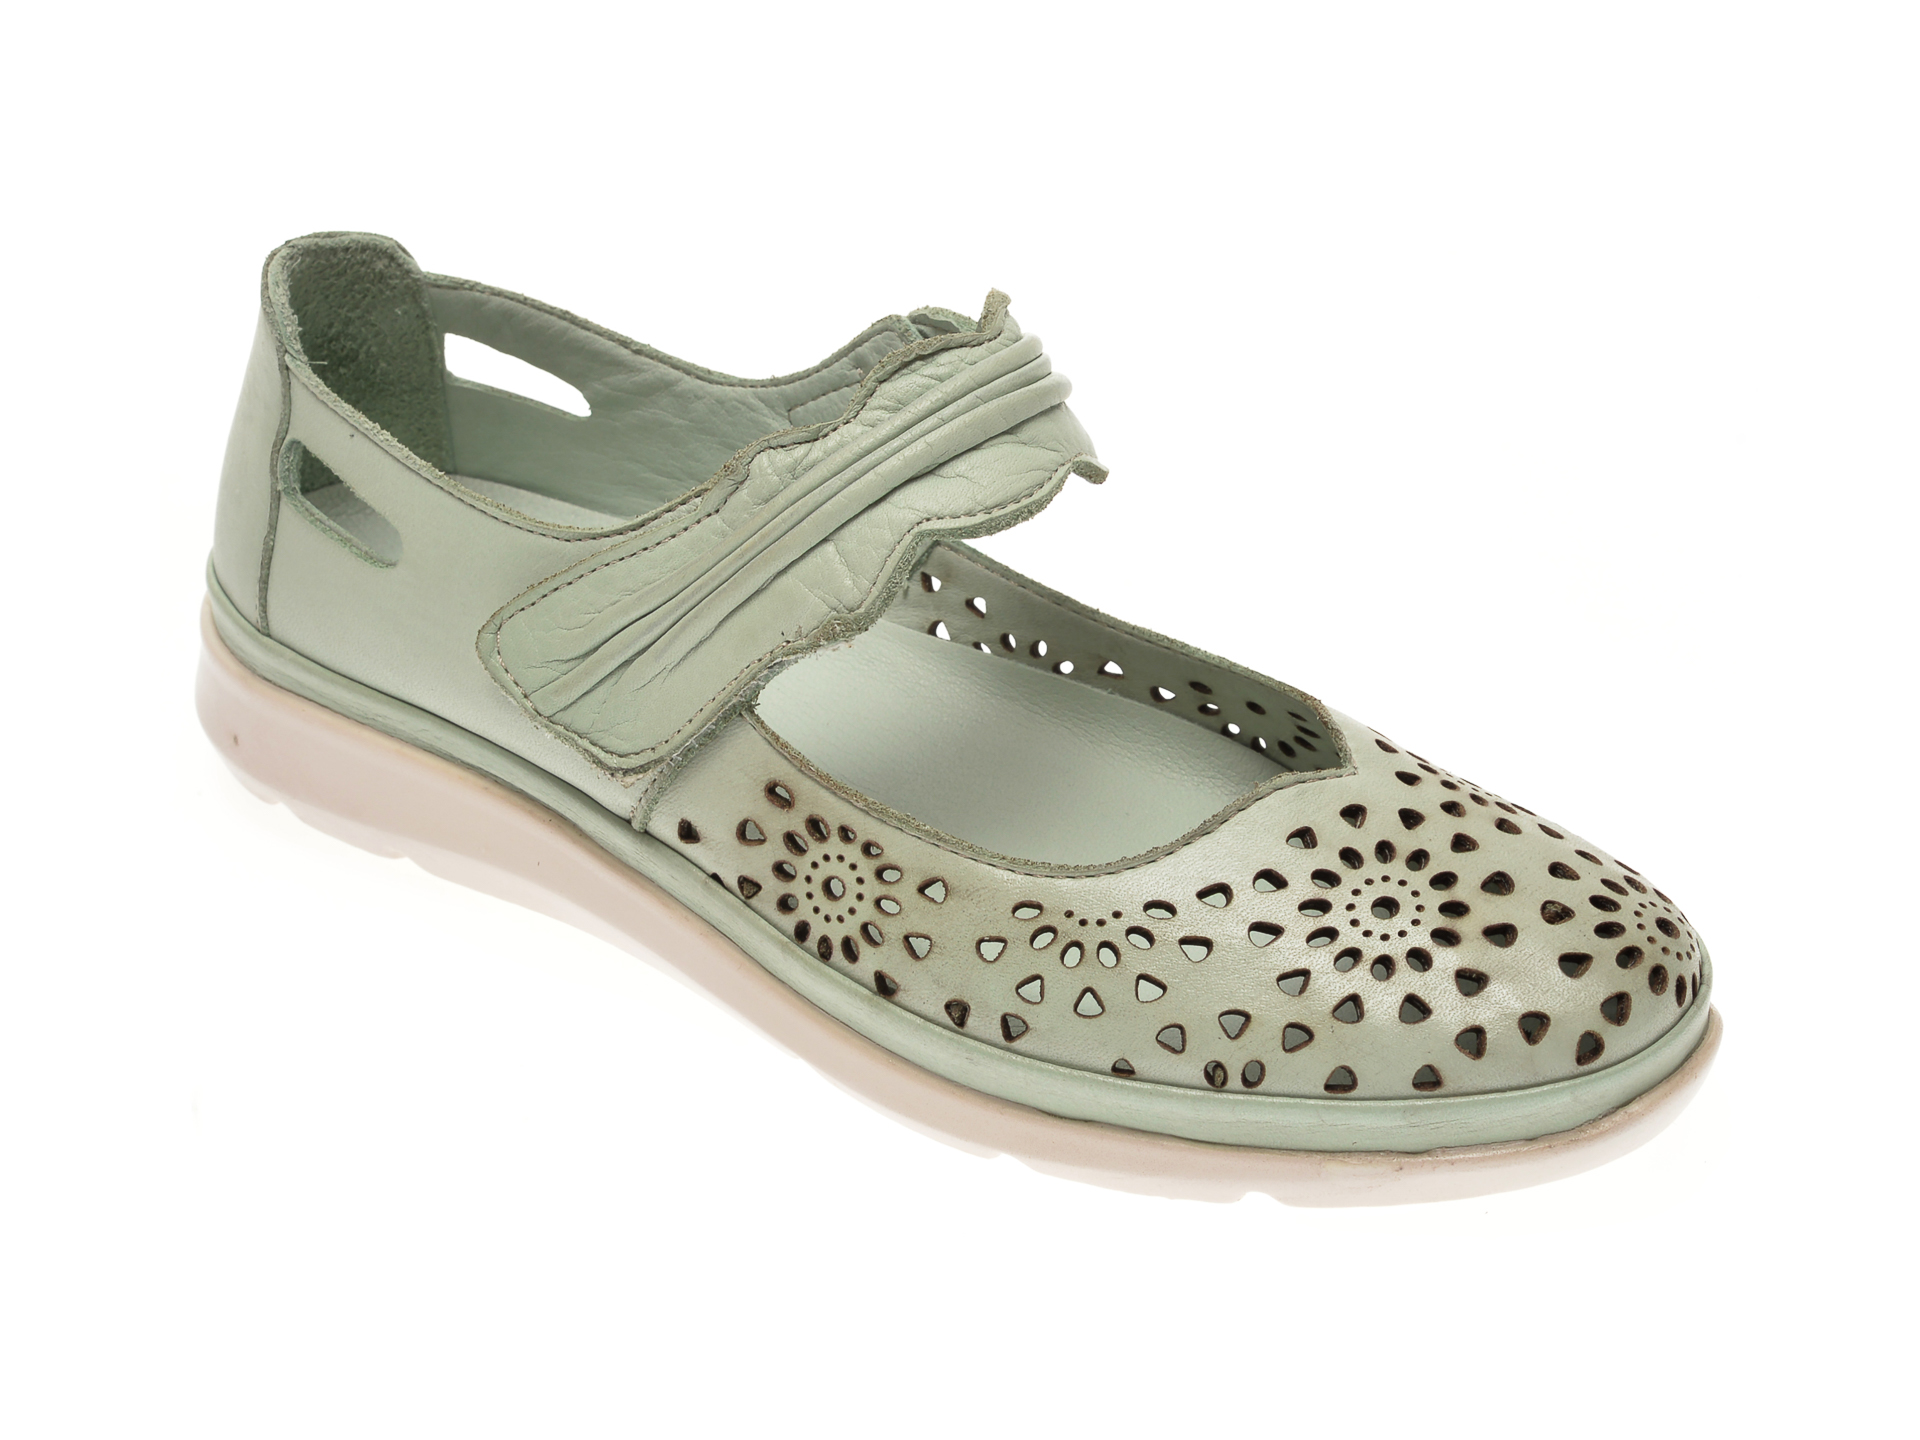 Pantofi MARCHA verzi, 600, din piele naturala